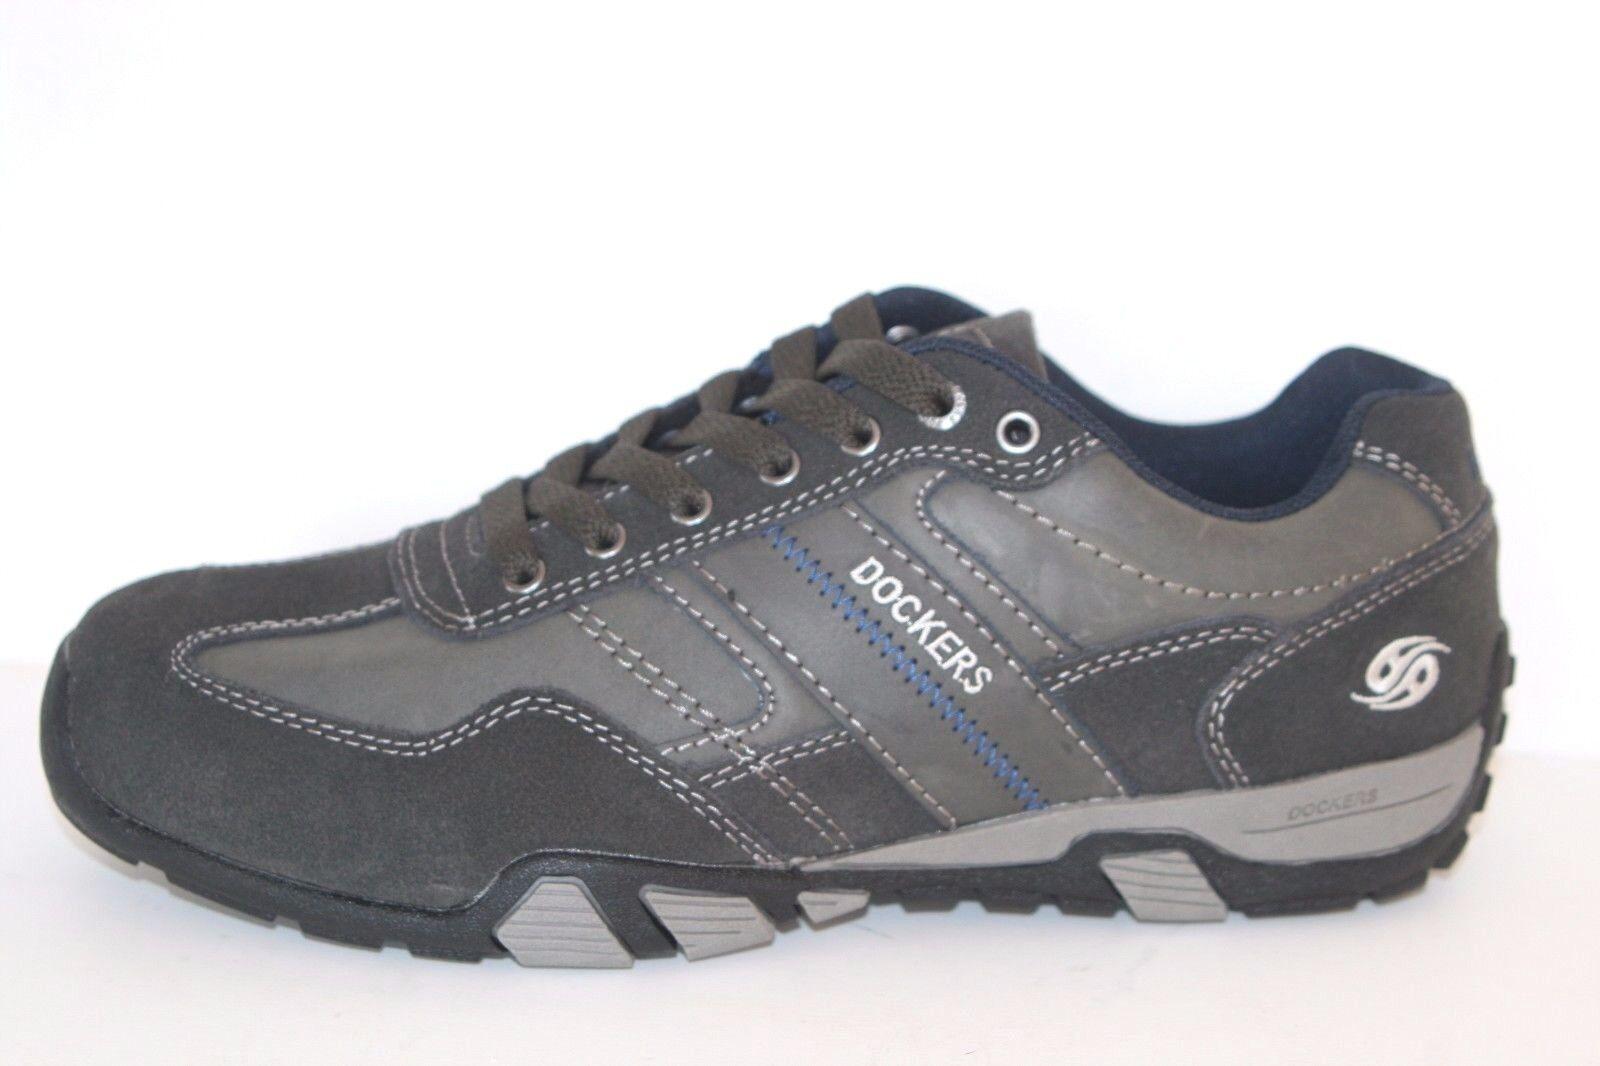 DOCKERS Schuhe Herren Halbschuhe Schnürschuhe Freizeitschuhe Männer asphalt grau